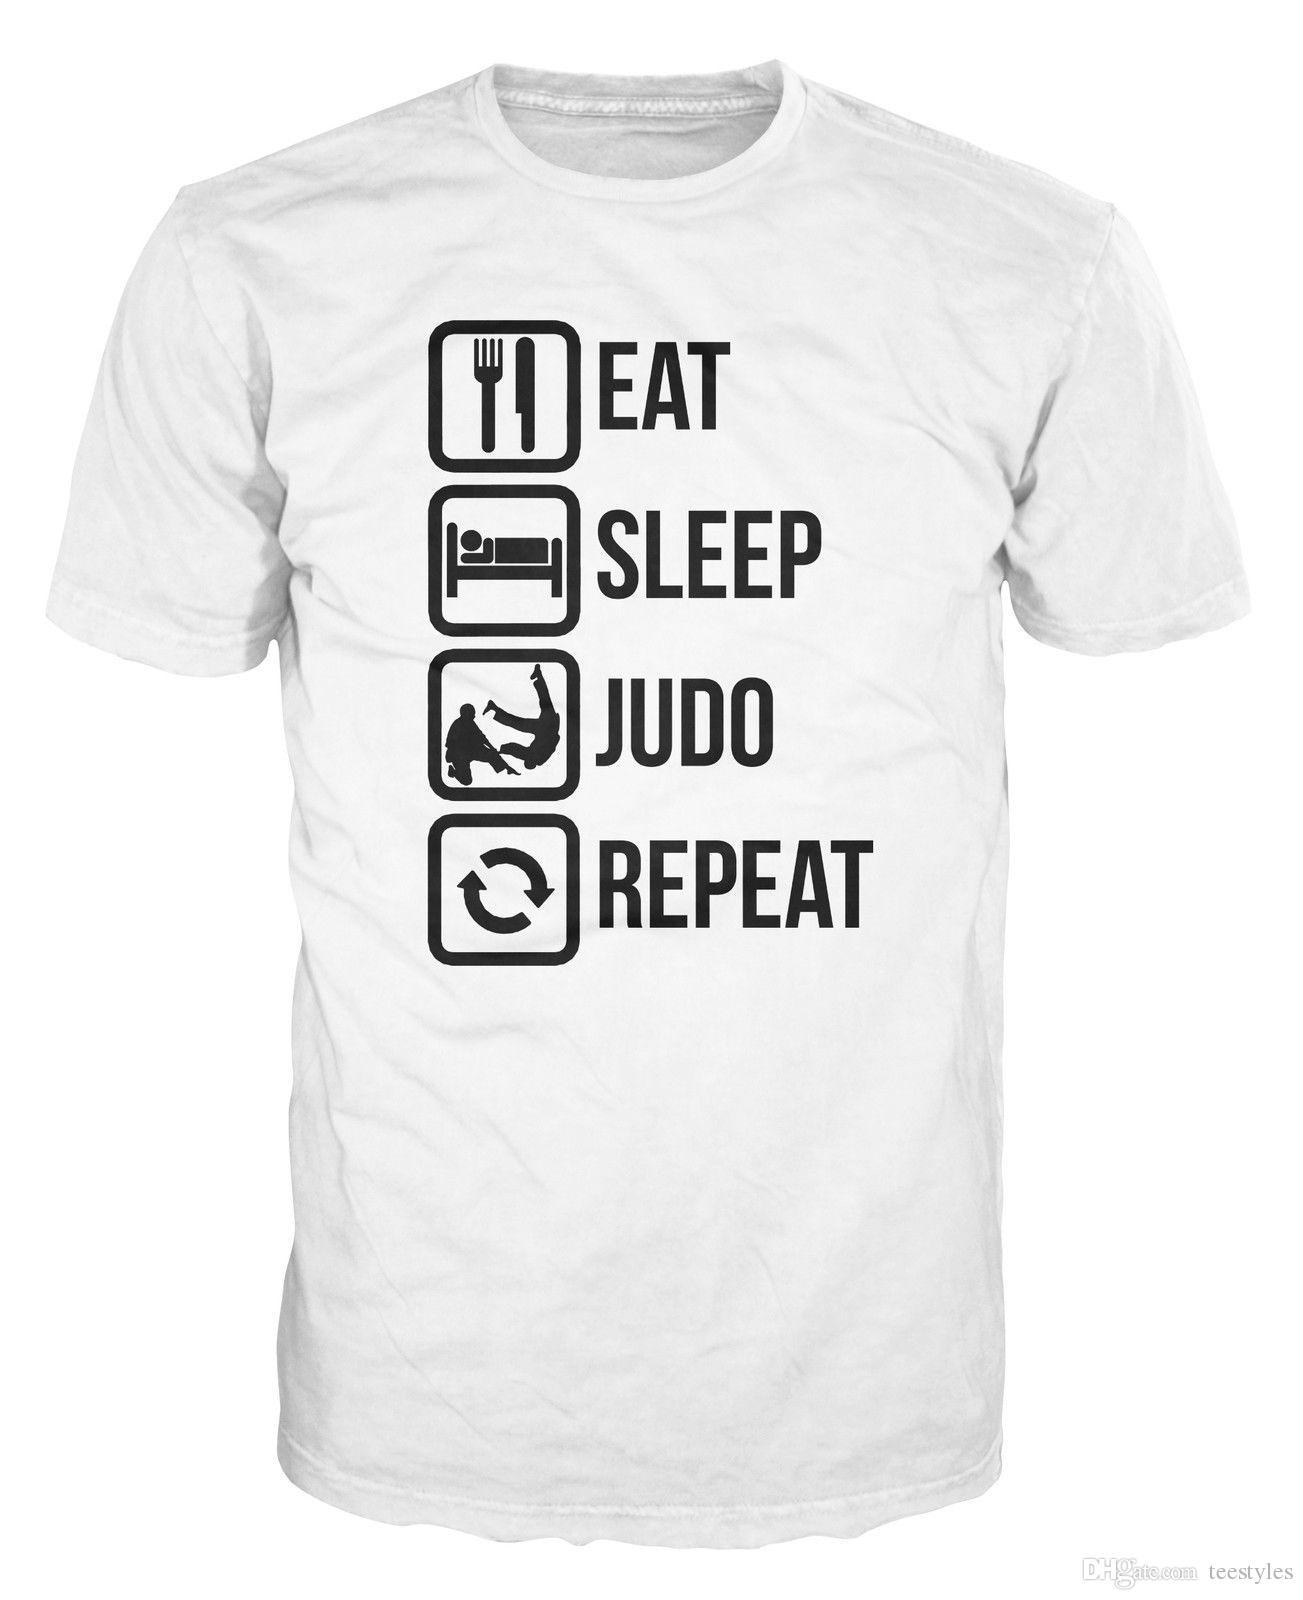 a8594ba1e Eat Sleep Judo Repeat Funny Martial Art Mma T Shirt T Shirt Men Man'S Print  Short Sleeve Cotton Custom 3XL Team T Shirts T Shirts Designer Funny Tee  Shirt ...